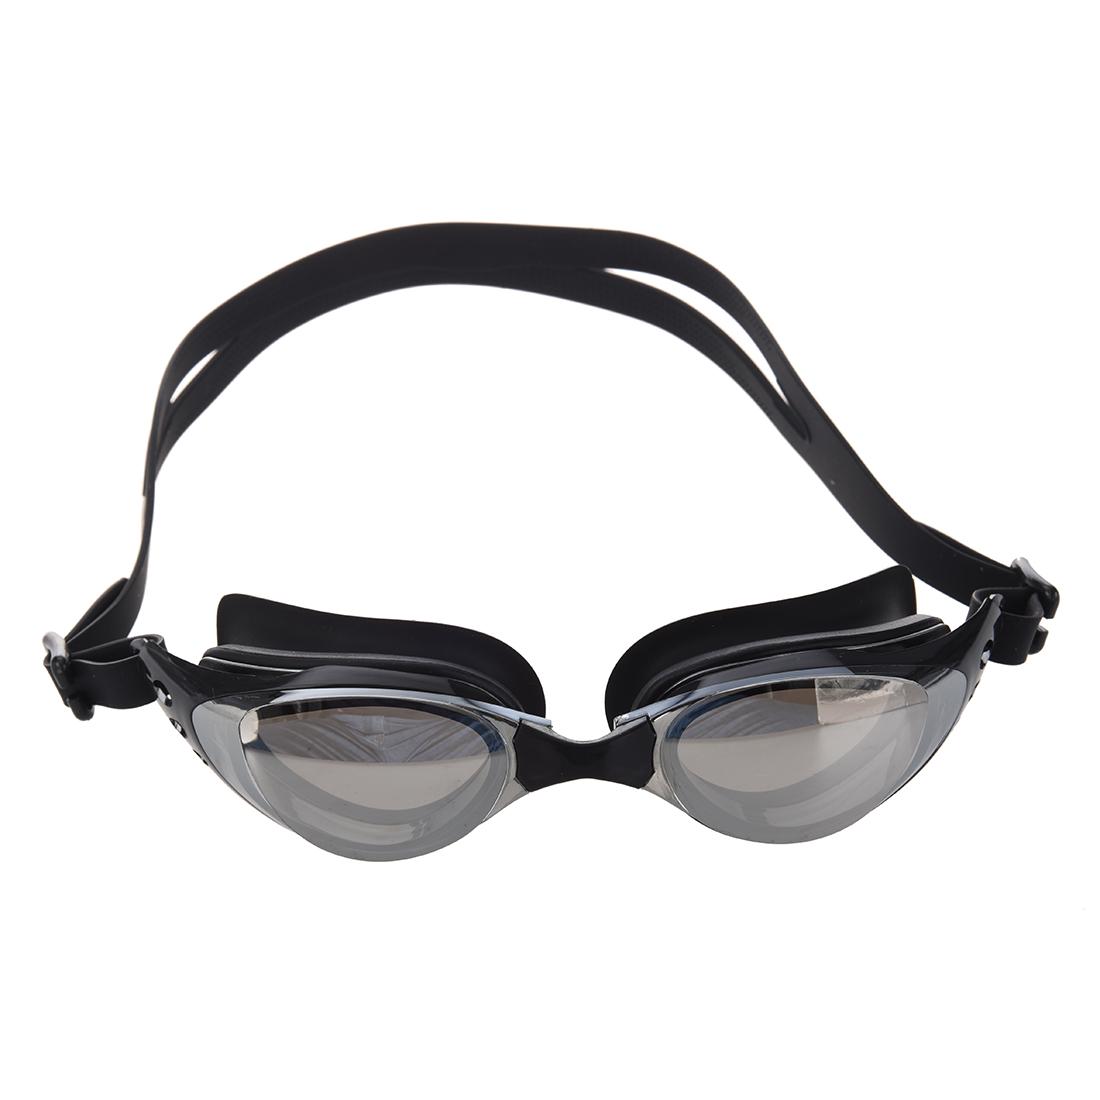 Black Swim Swimming Water Silicone Pool Adult Goggles Eye